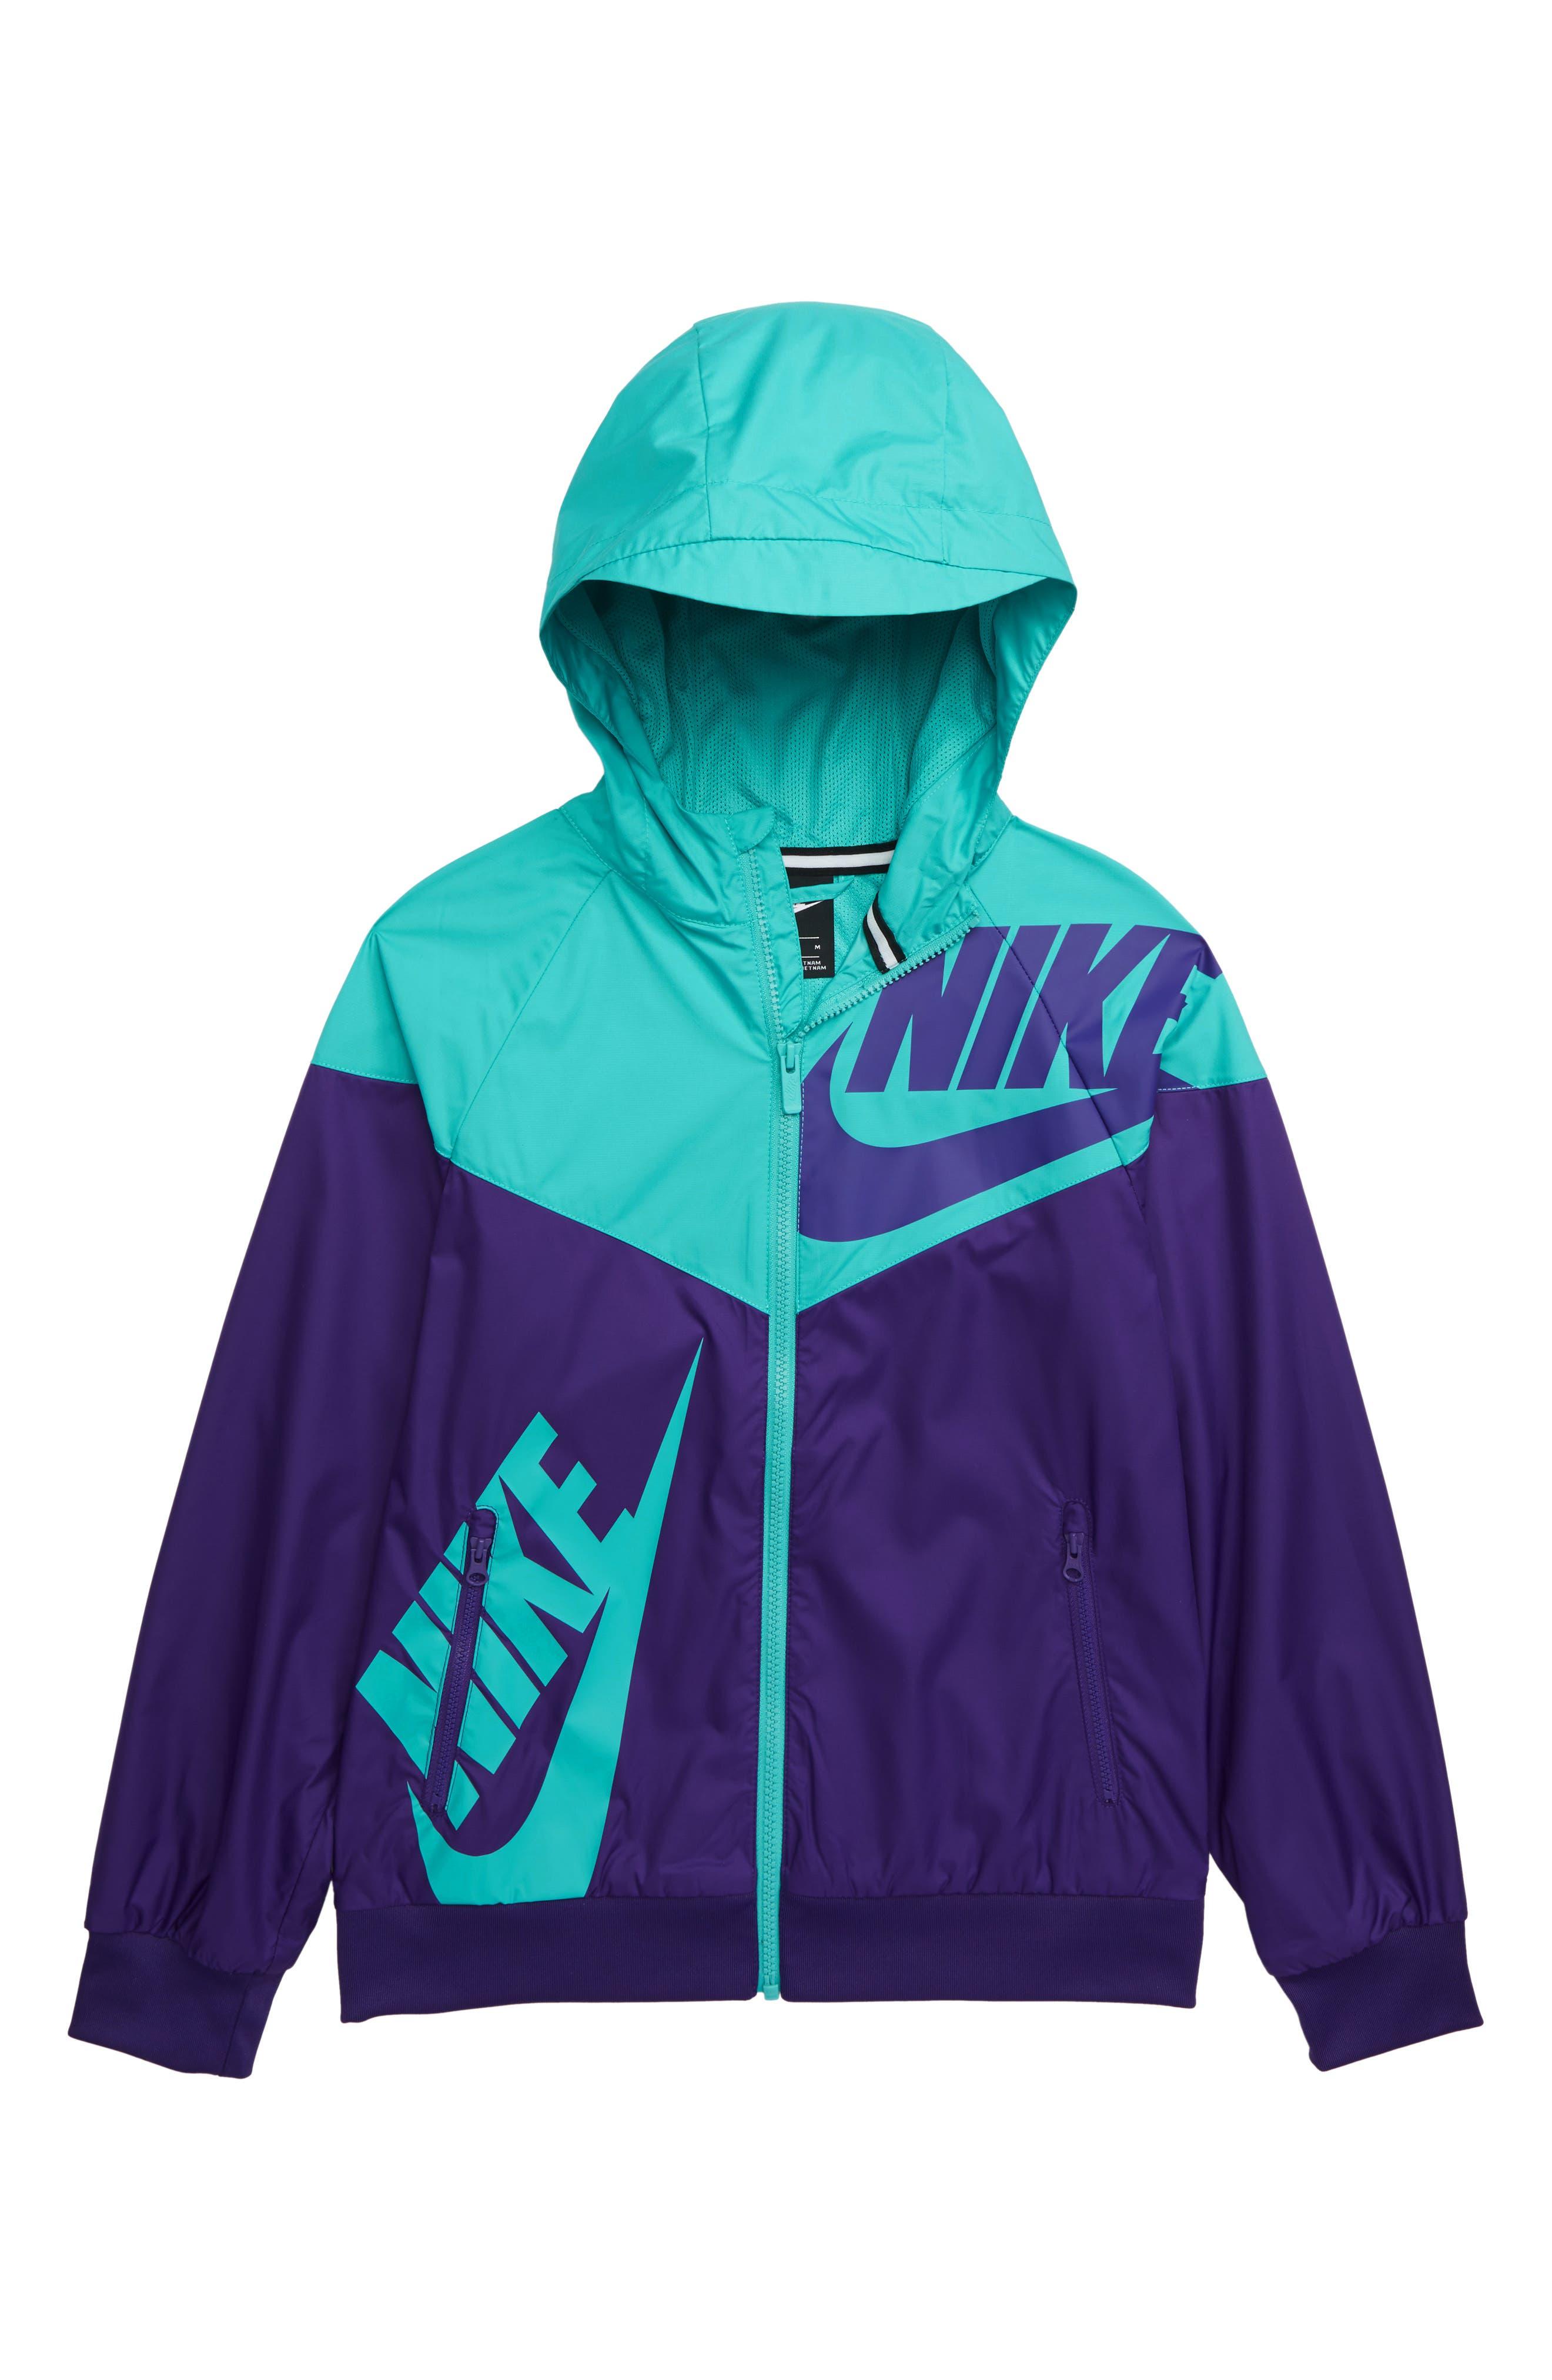 NIKE, Sportswear Windrunner Zip Jacket, Main thumbnail 1, color, COURT PURPLE/ CABANA